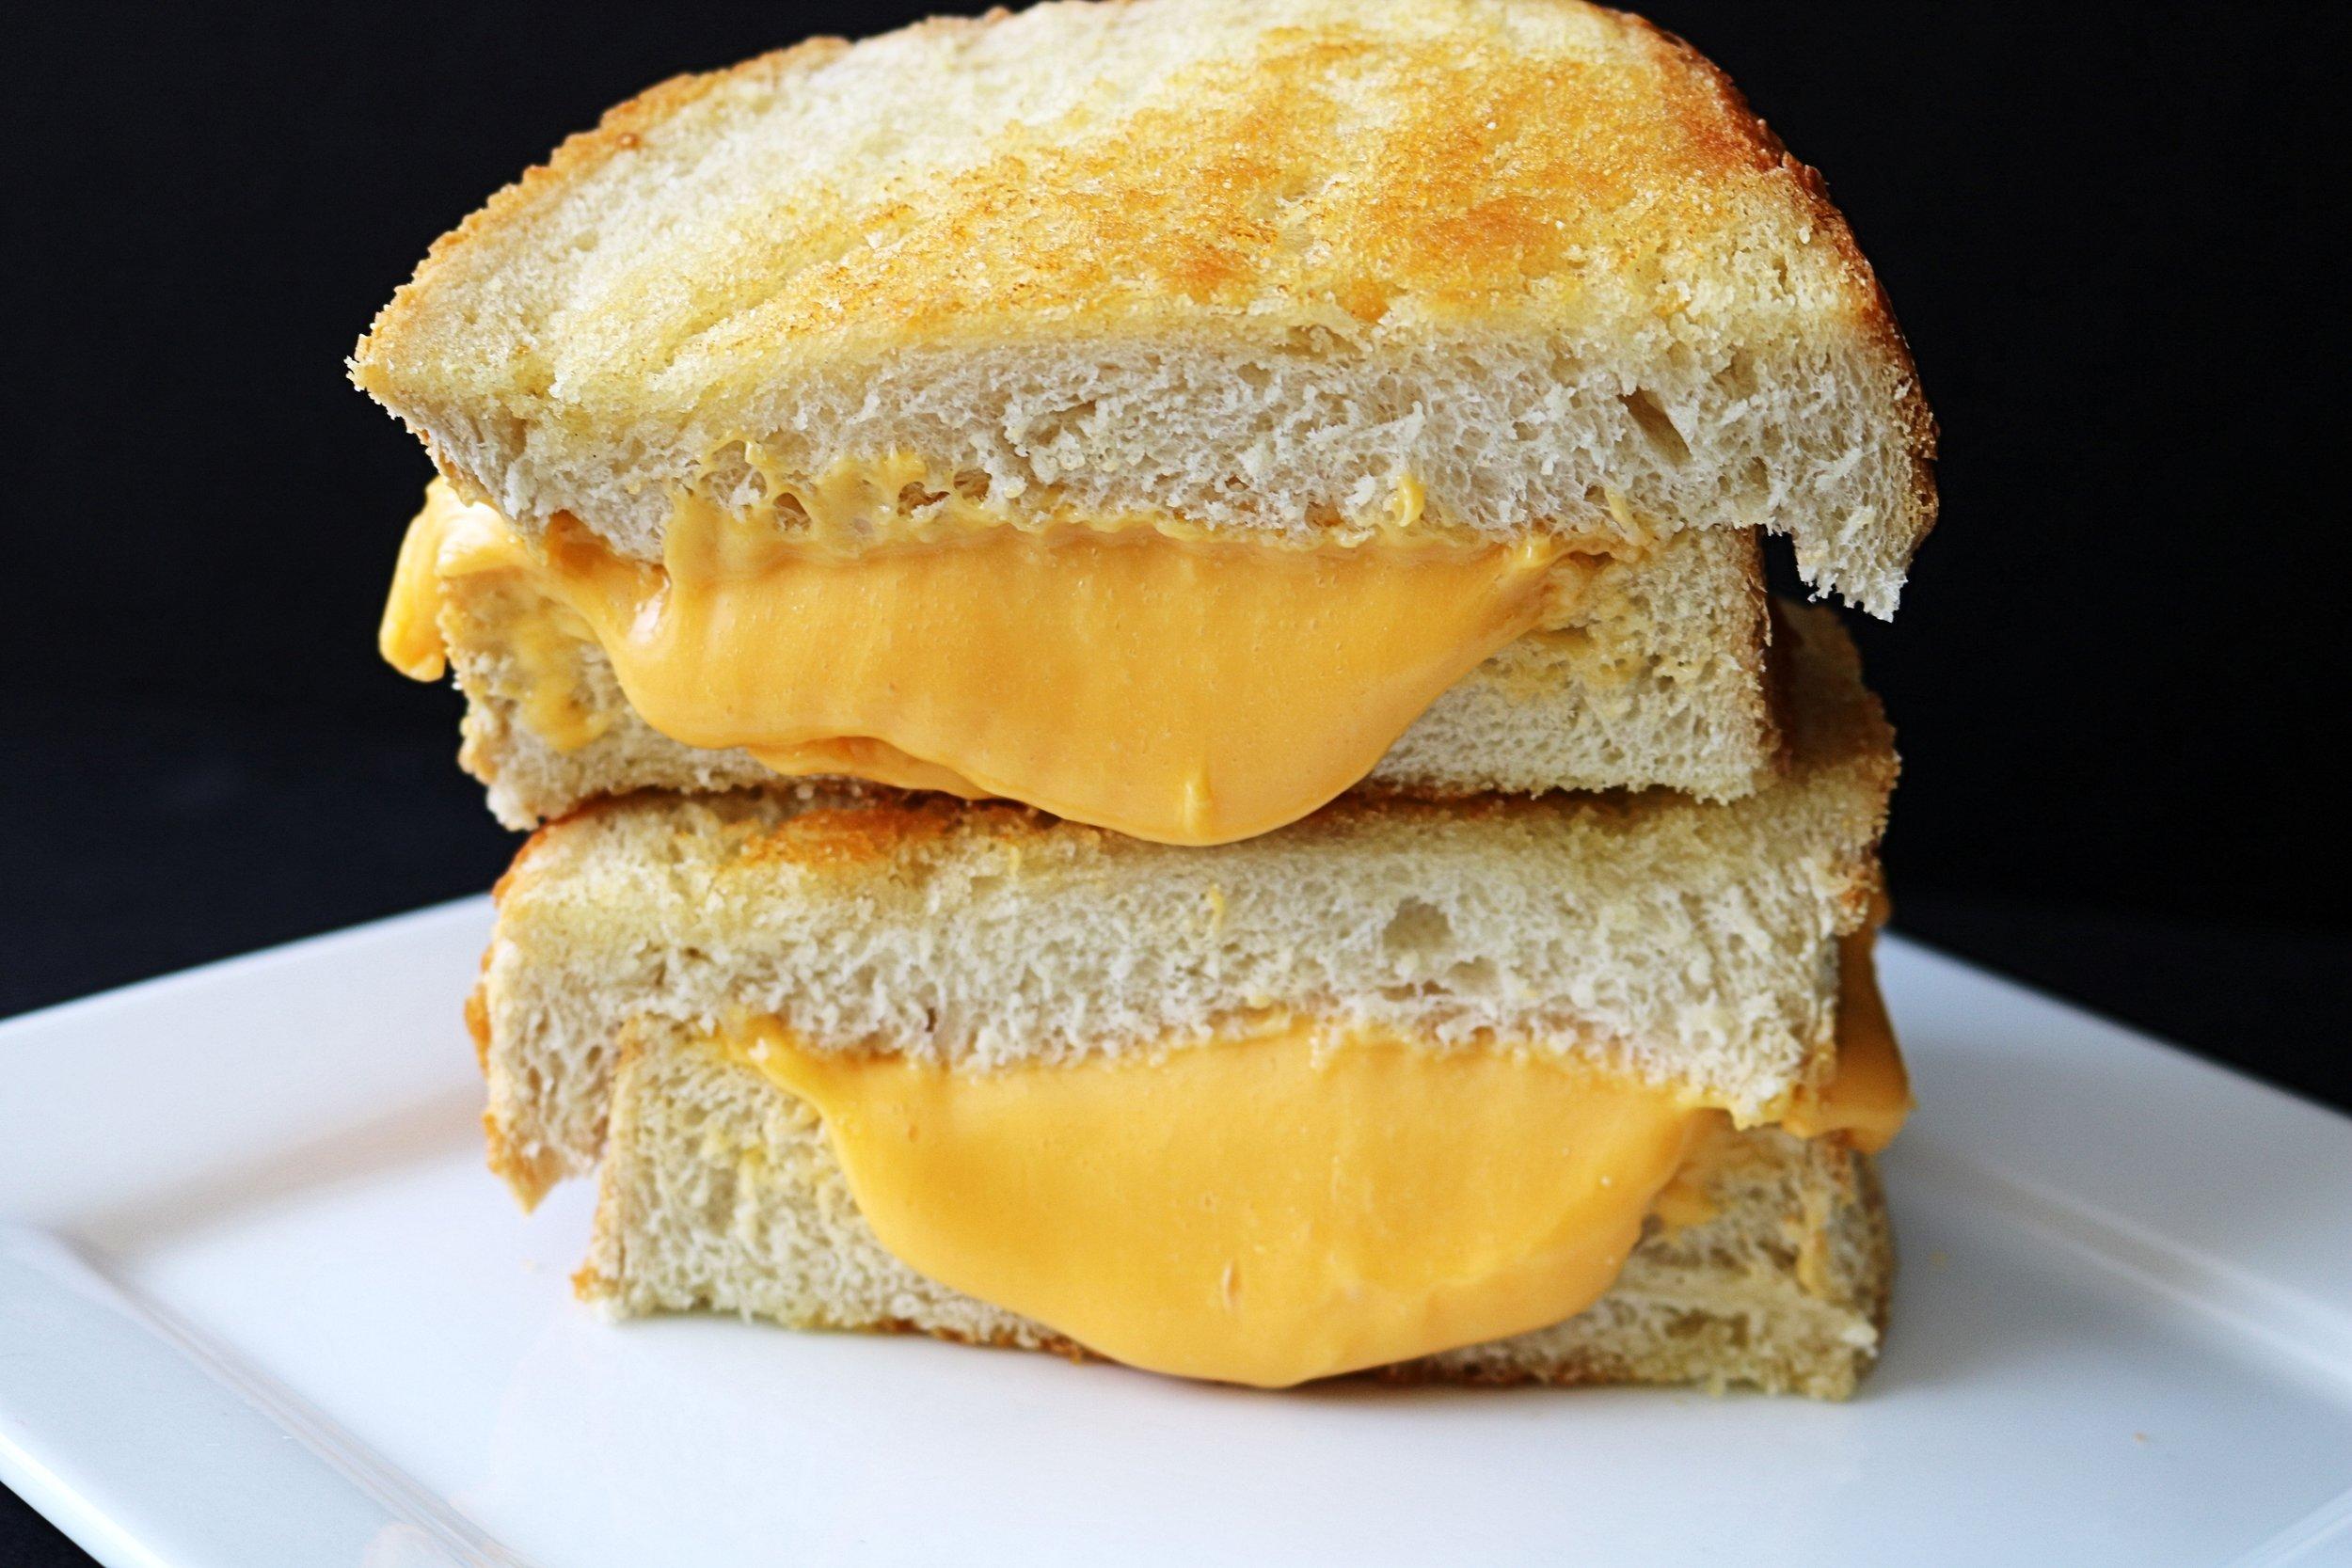 sandwich-2573878.jpg